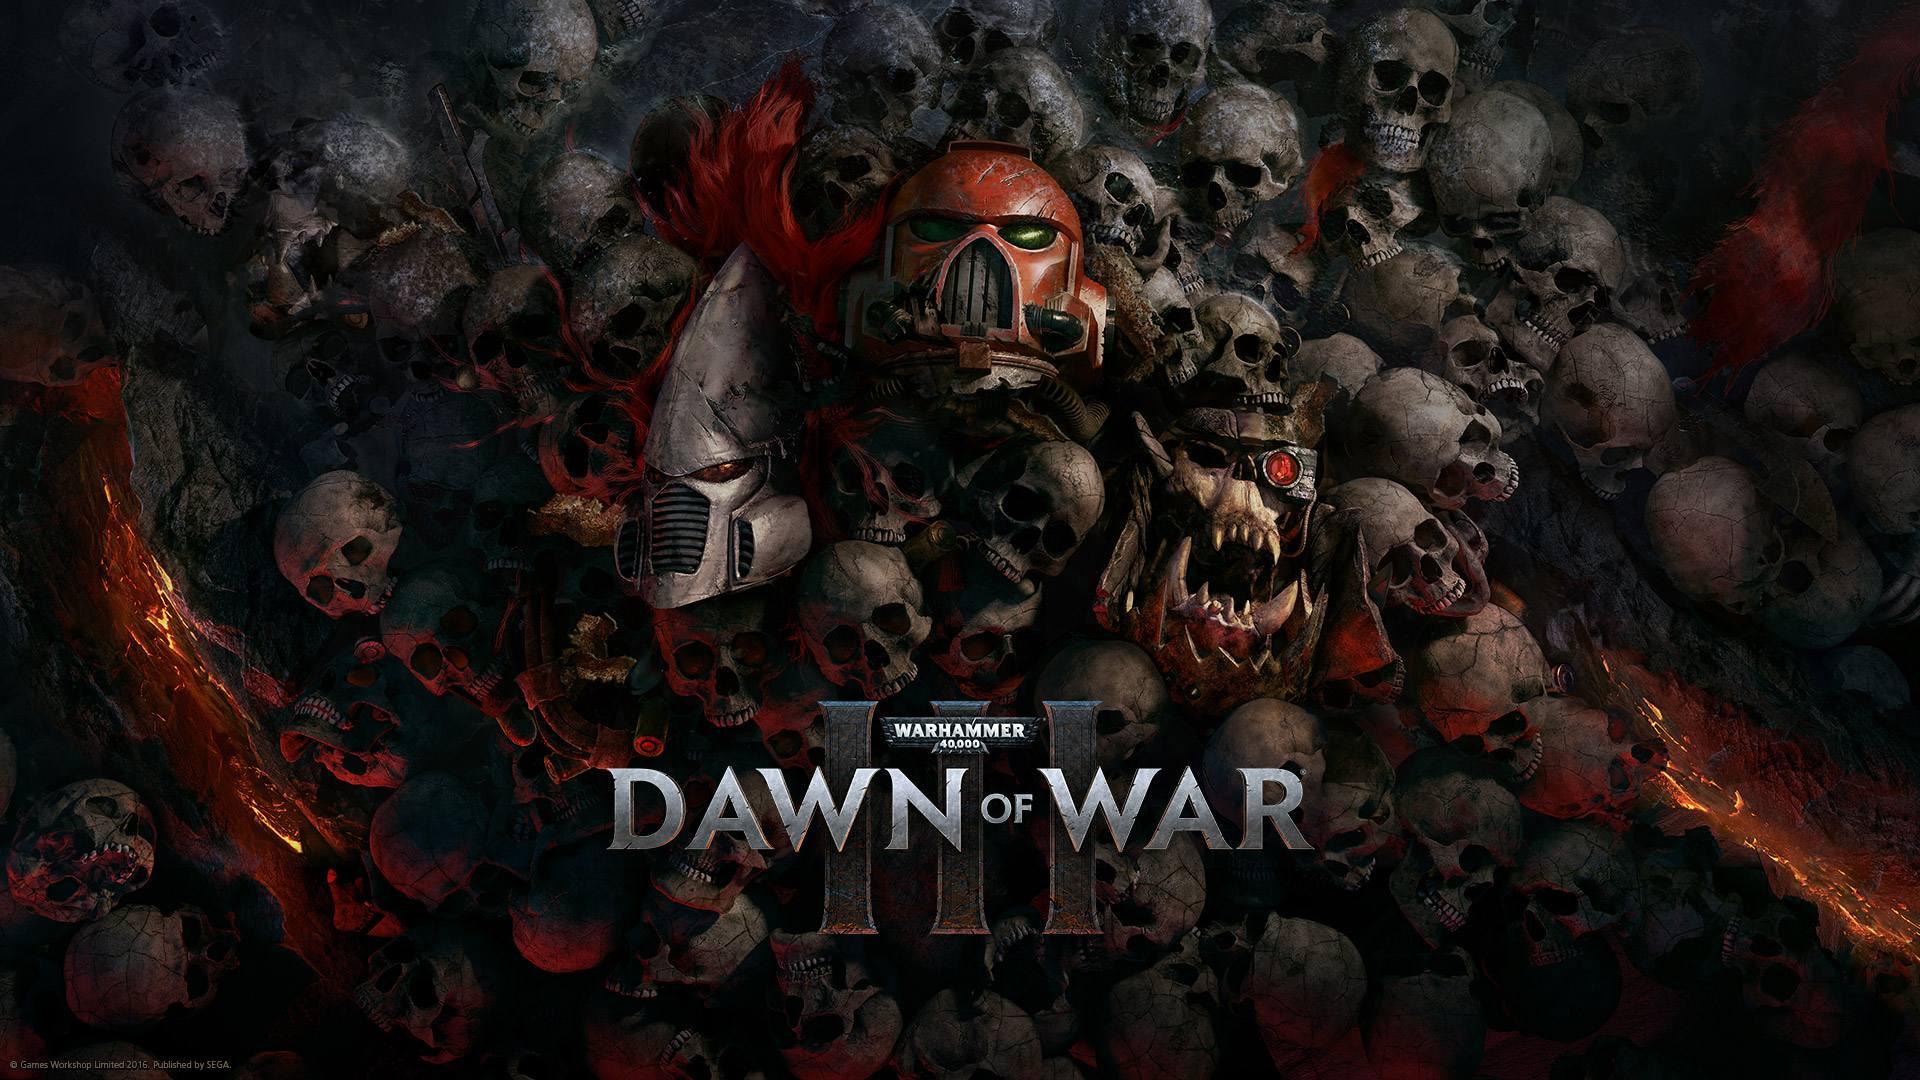 Warhammer 40K Dawn of War III 03-05-16 001